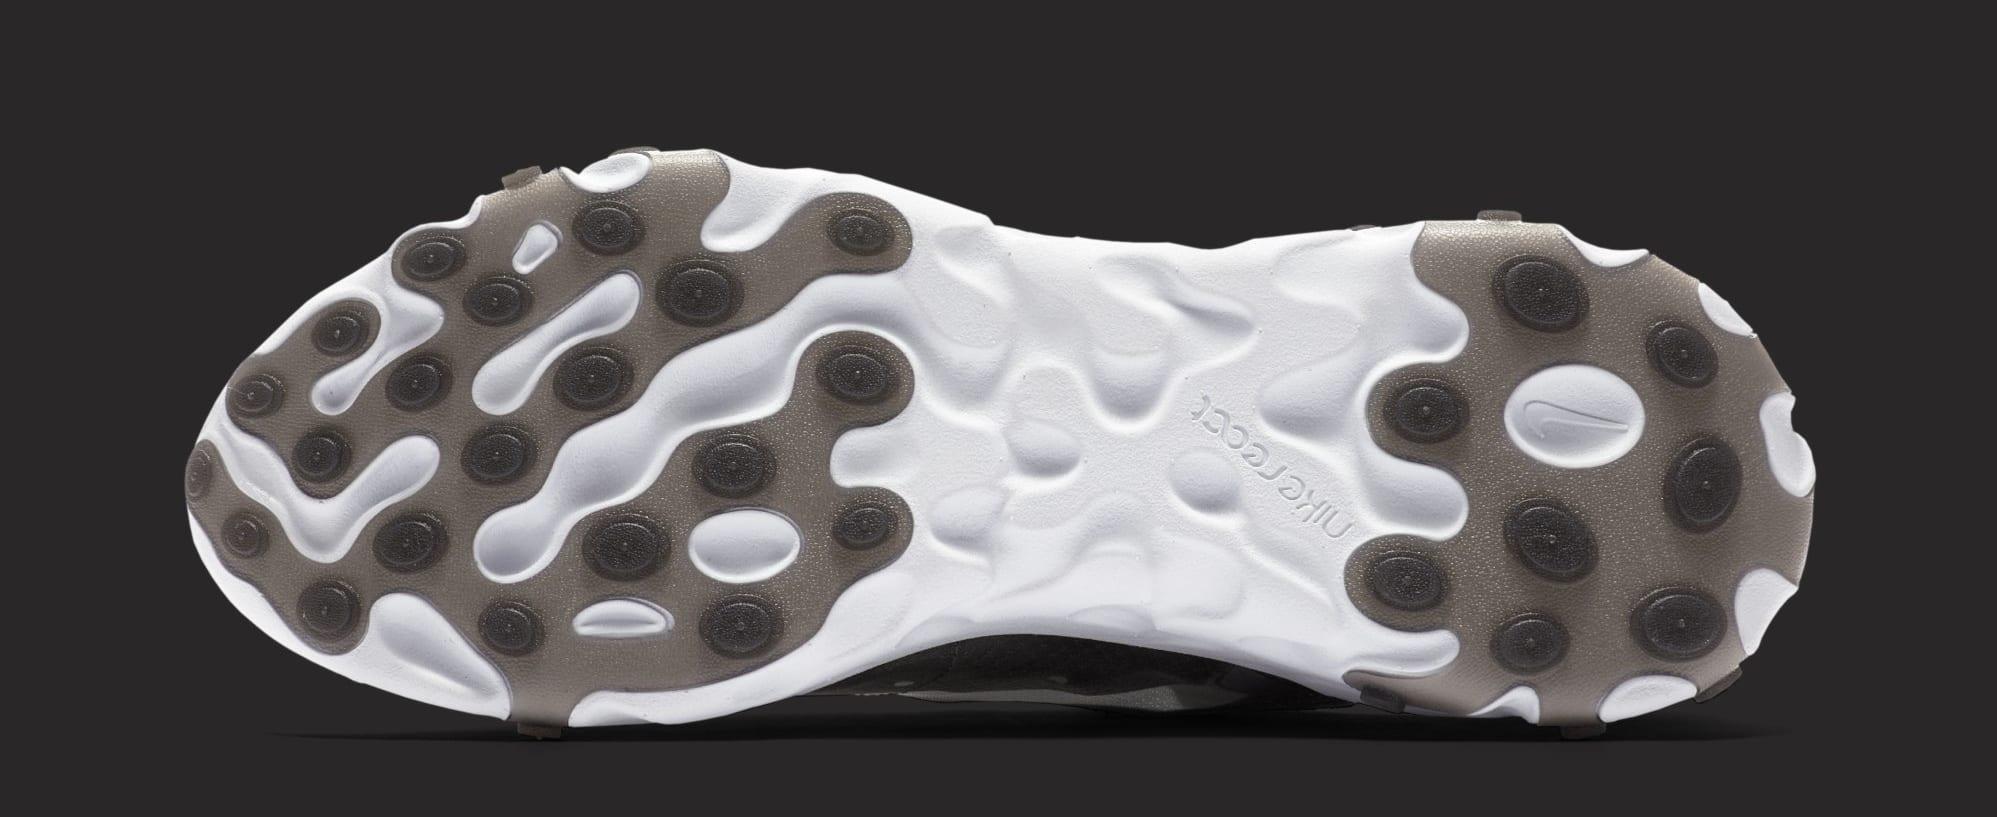 Nike React Element 87 'Anthracite/Black/White' AQ1090-001 (Sole)